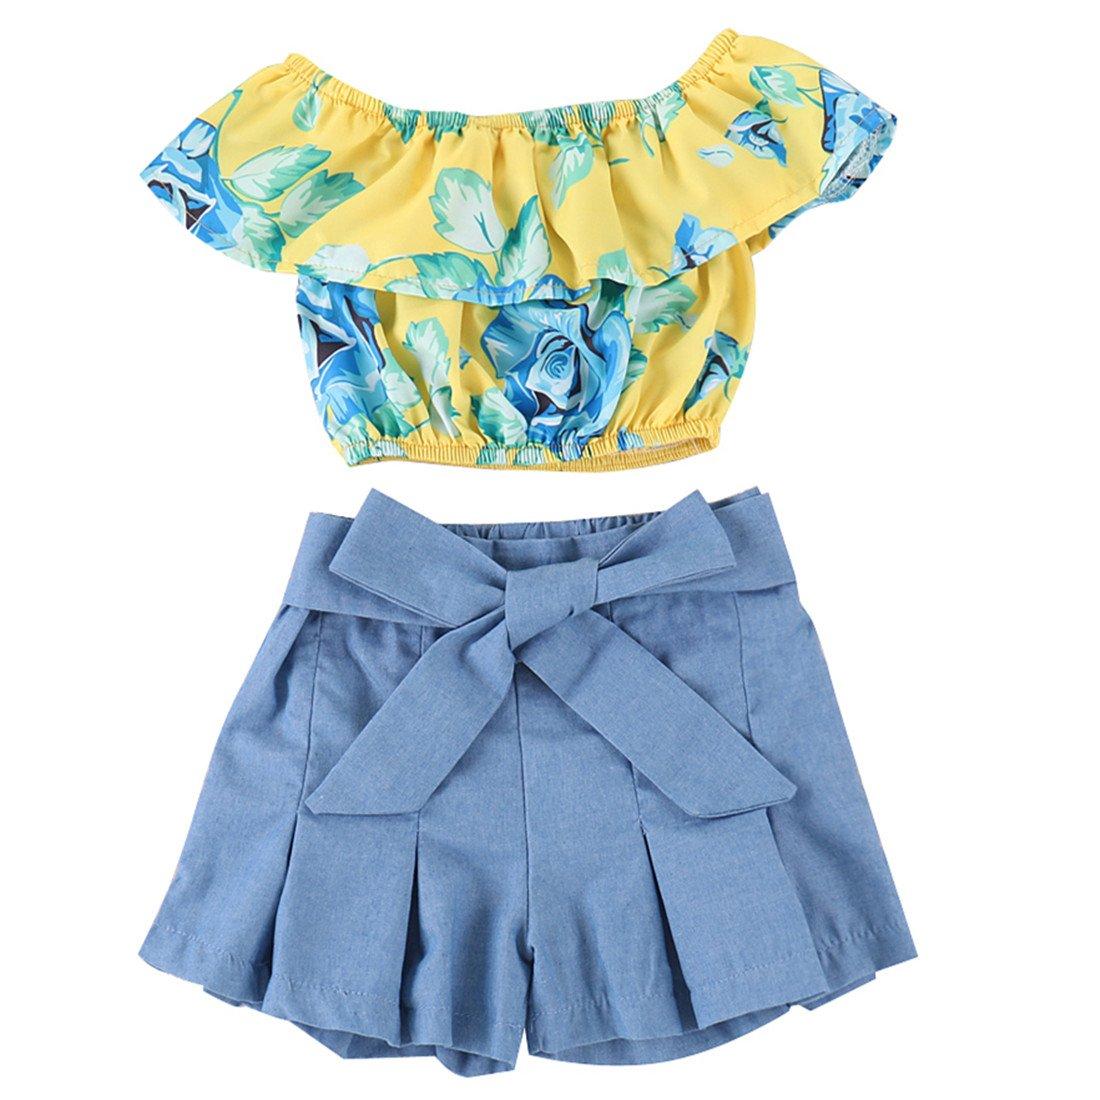 Toddler Baby Girls Clothes Floral Ruffle Off Shoulder Crop Tops + Denim Shorts Skirt Set Kids Summer Outfits